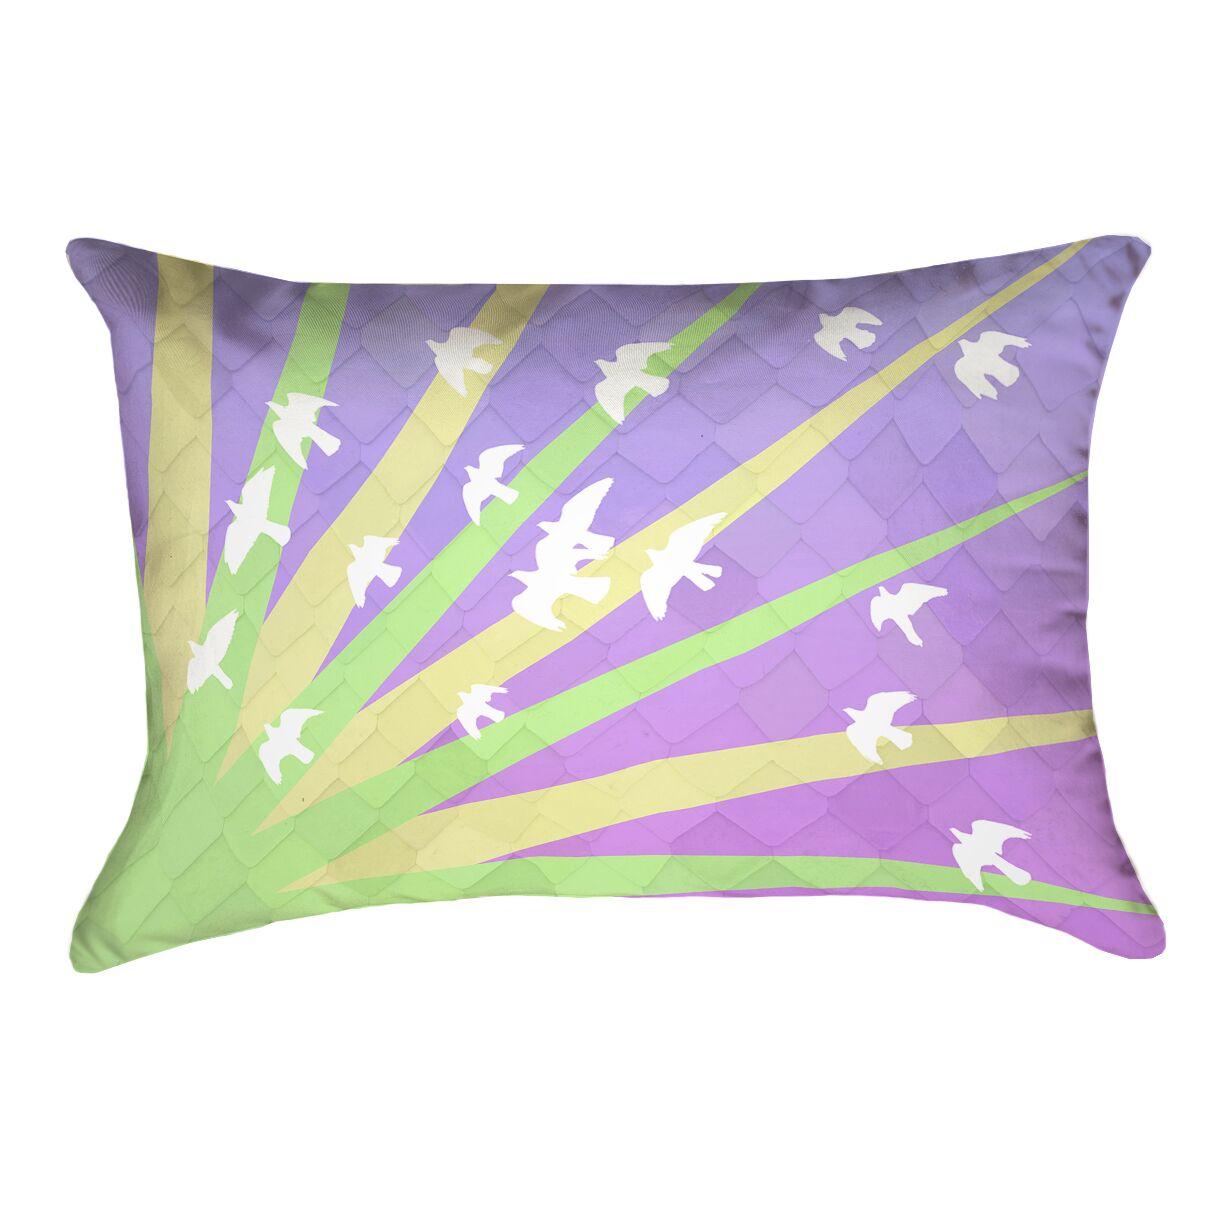 Enciso Birds and Sun Zipper Lumbar Pillow Color: Pink/Yellow/Blue